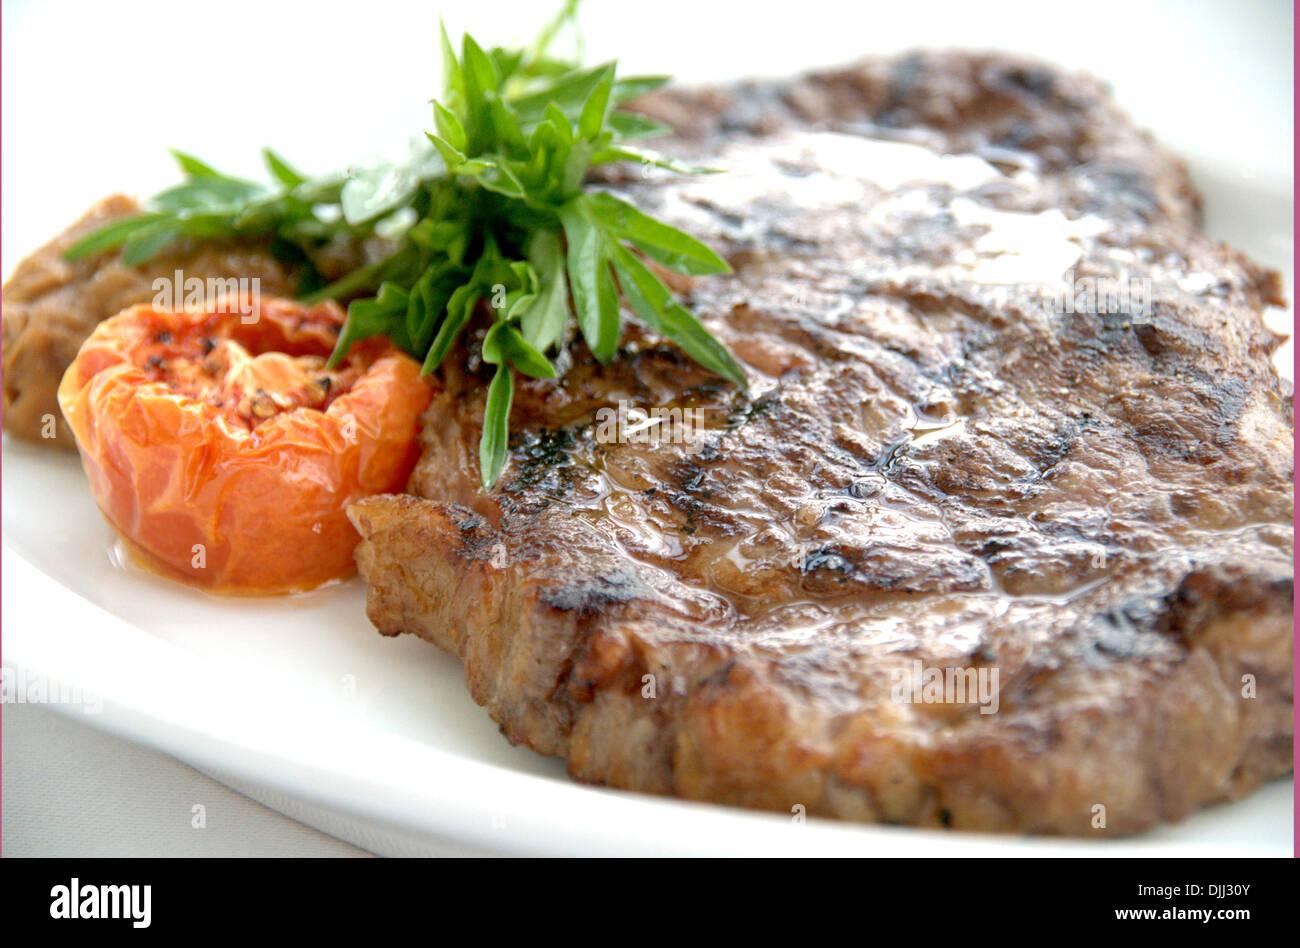 Australian Wagyu Ribeye Steak - Stock Image